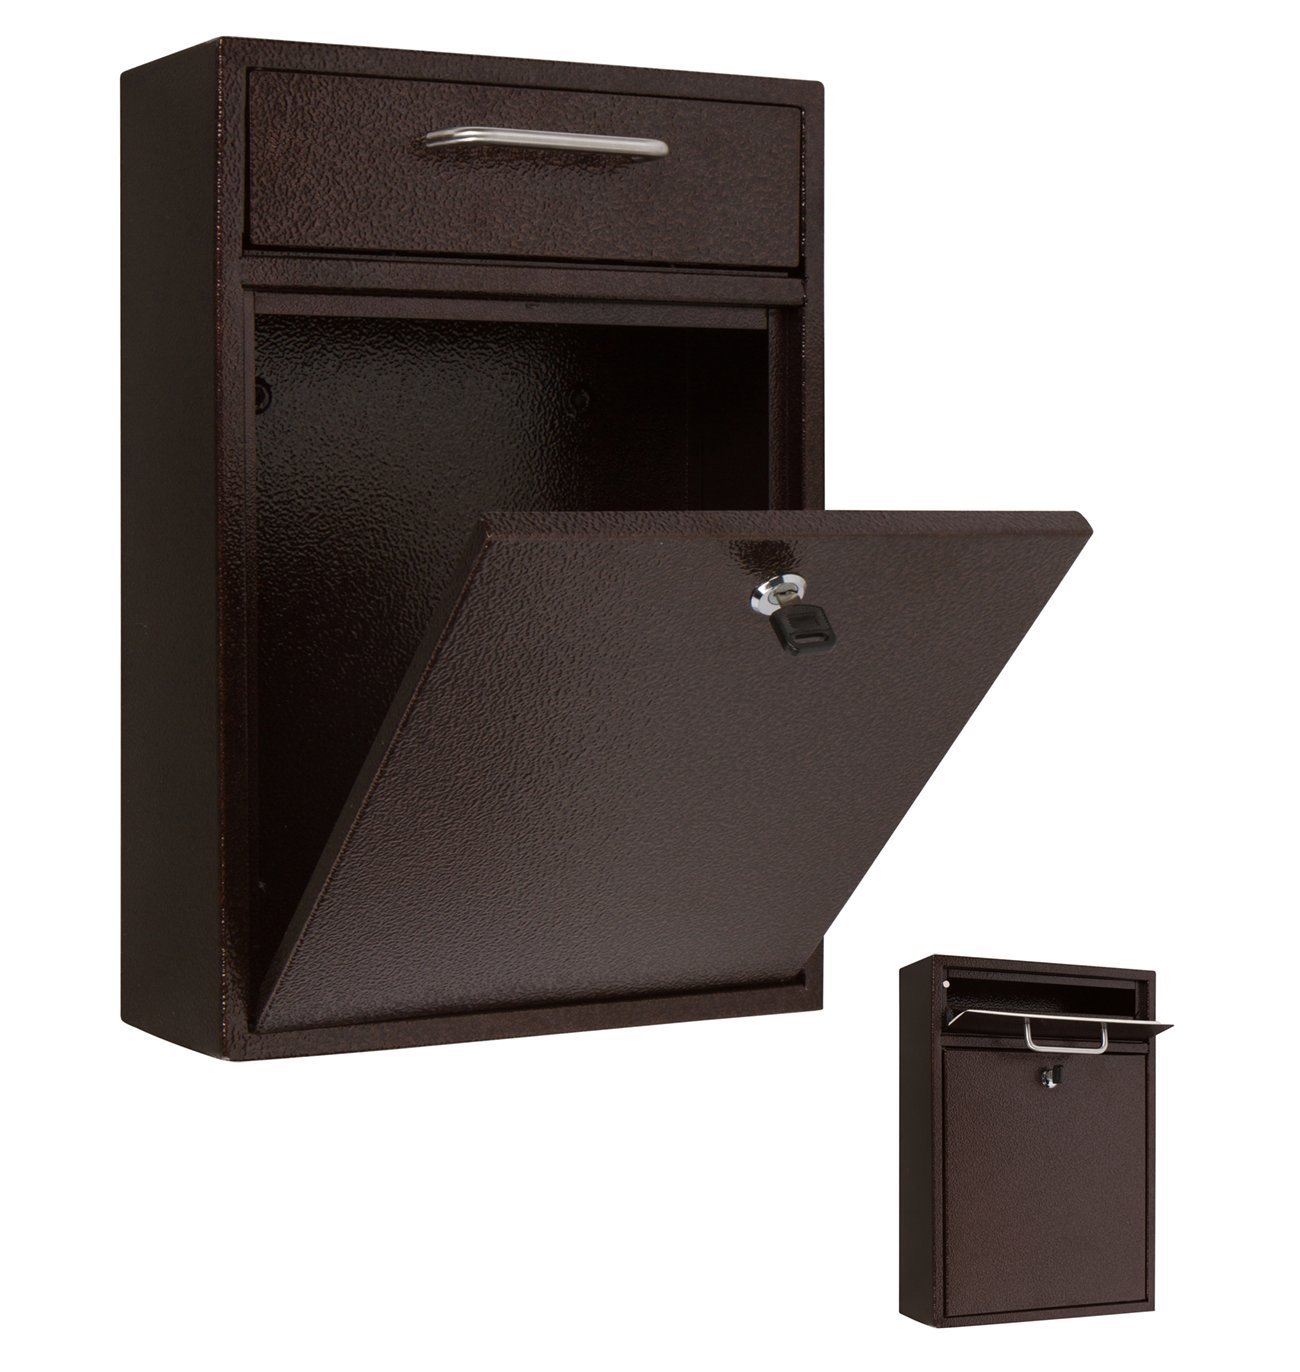 16 5 Quot X 11 5 Quot Wall Mounted Locking Drop Box Mailbox